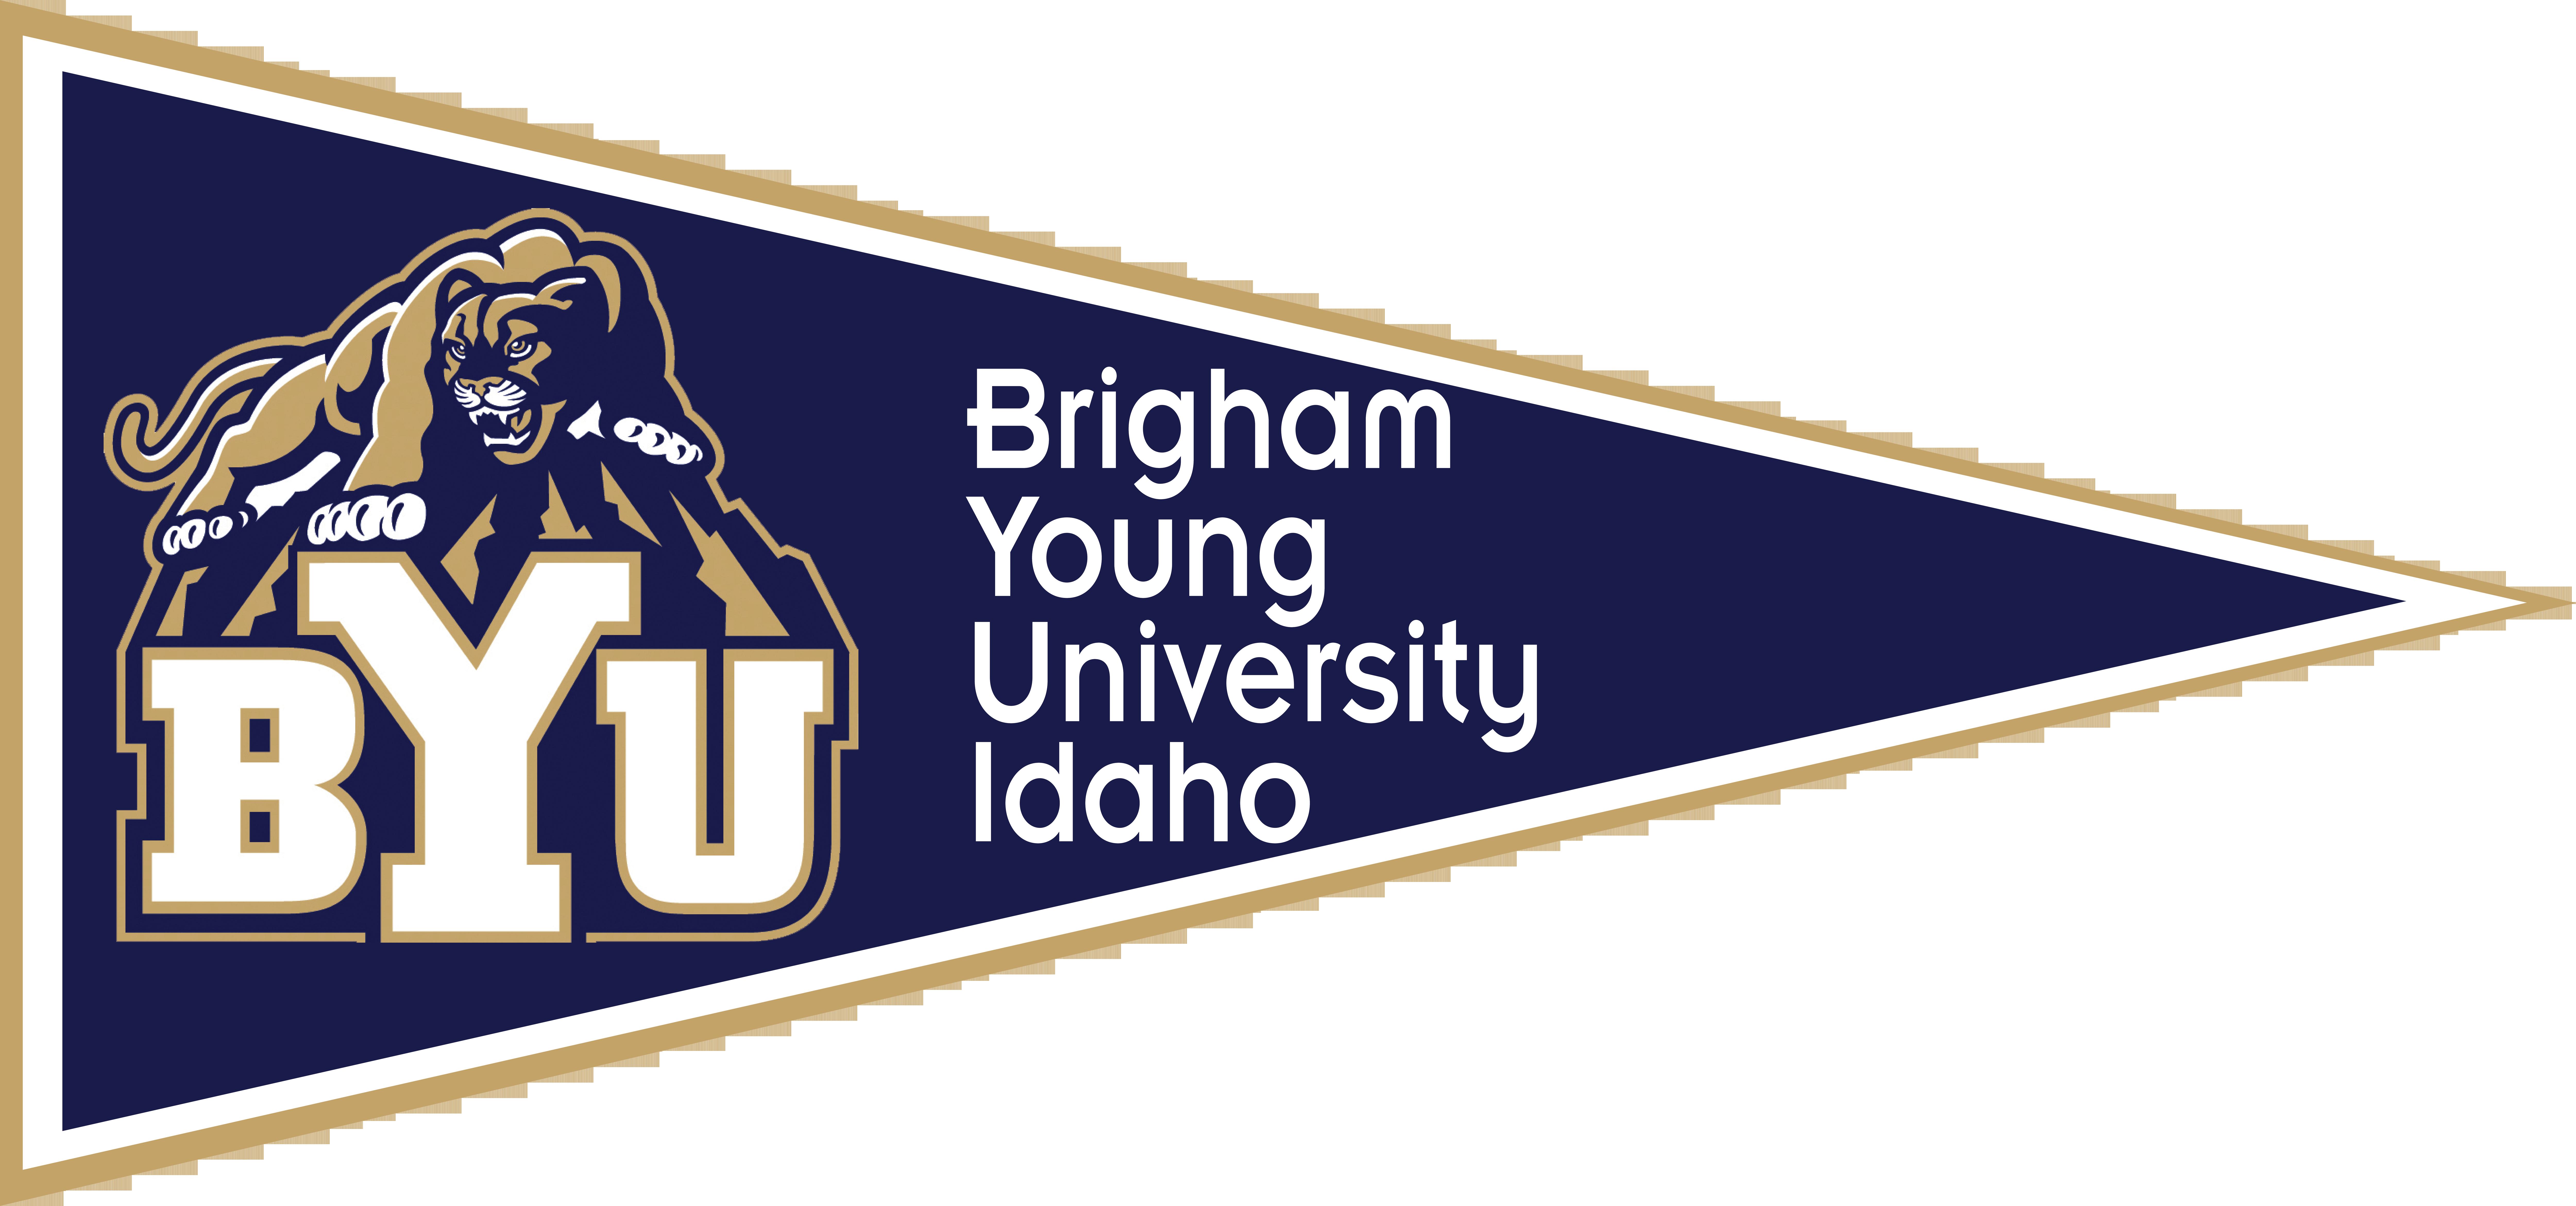 brigham young university idaho pennant | gear up, Presentation templates